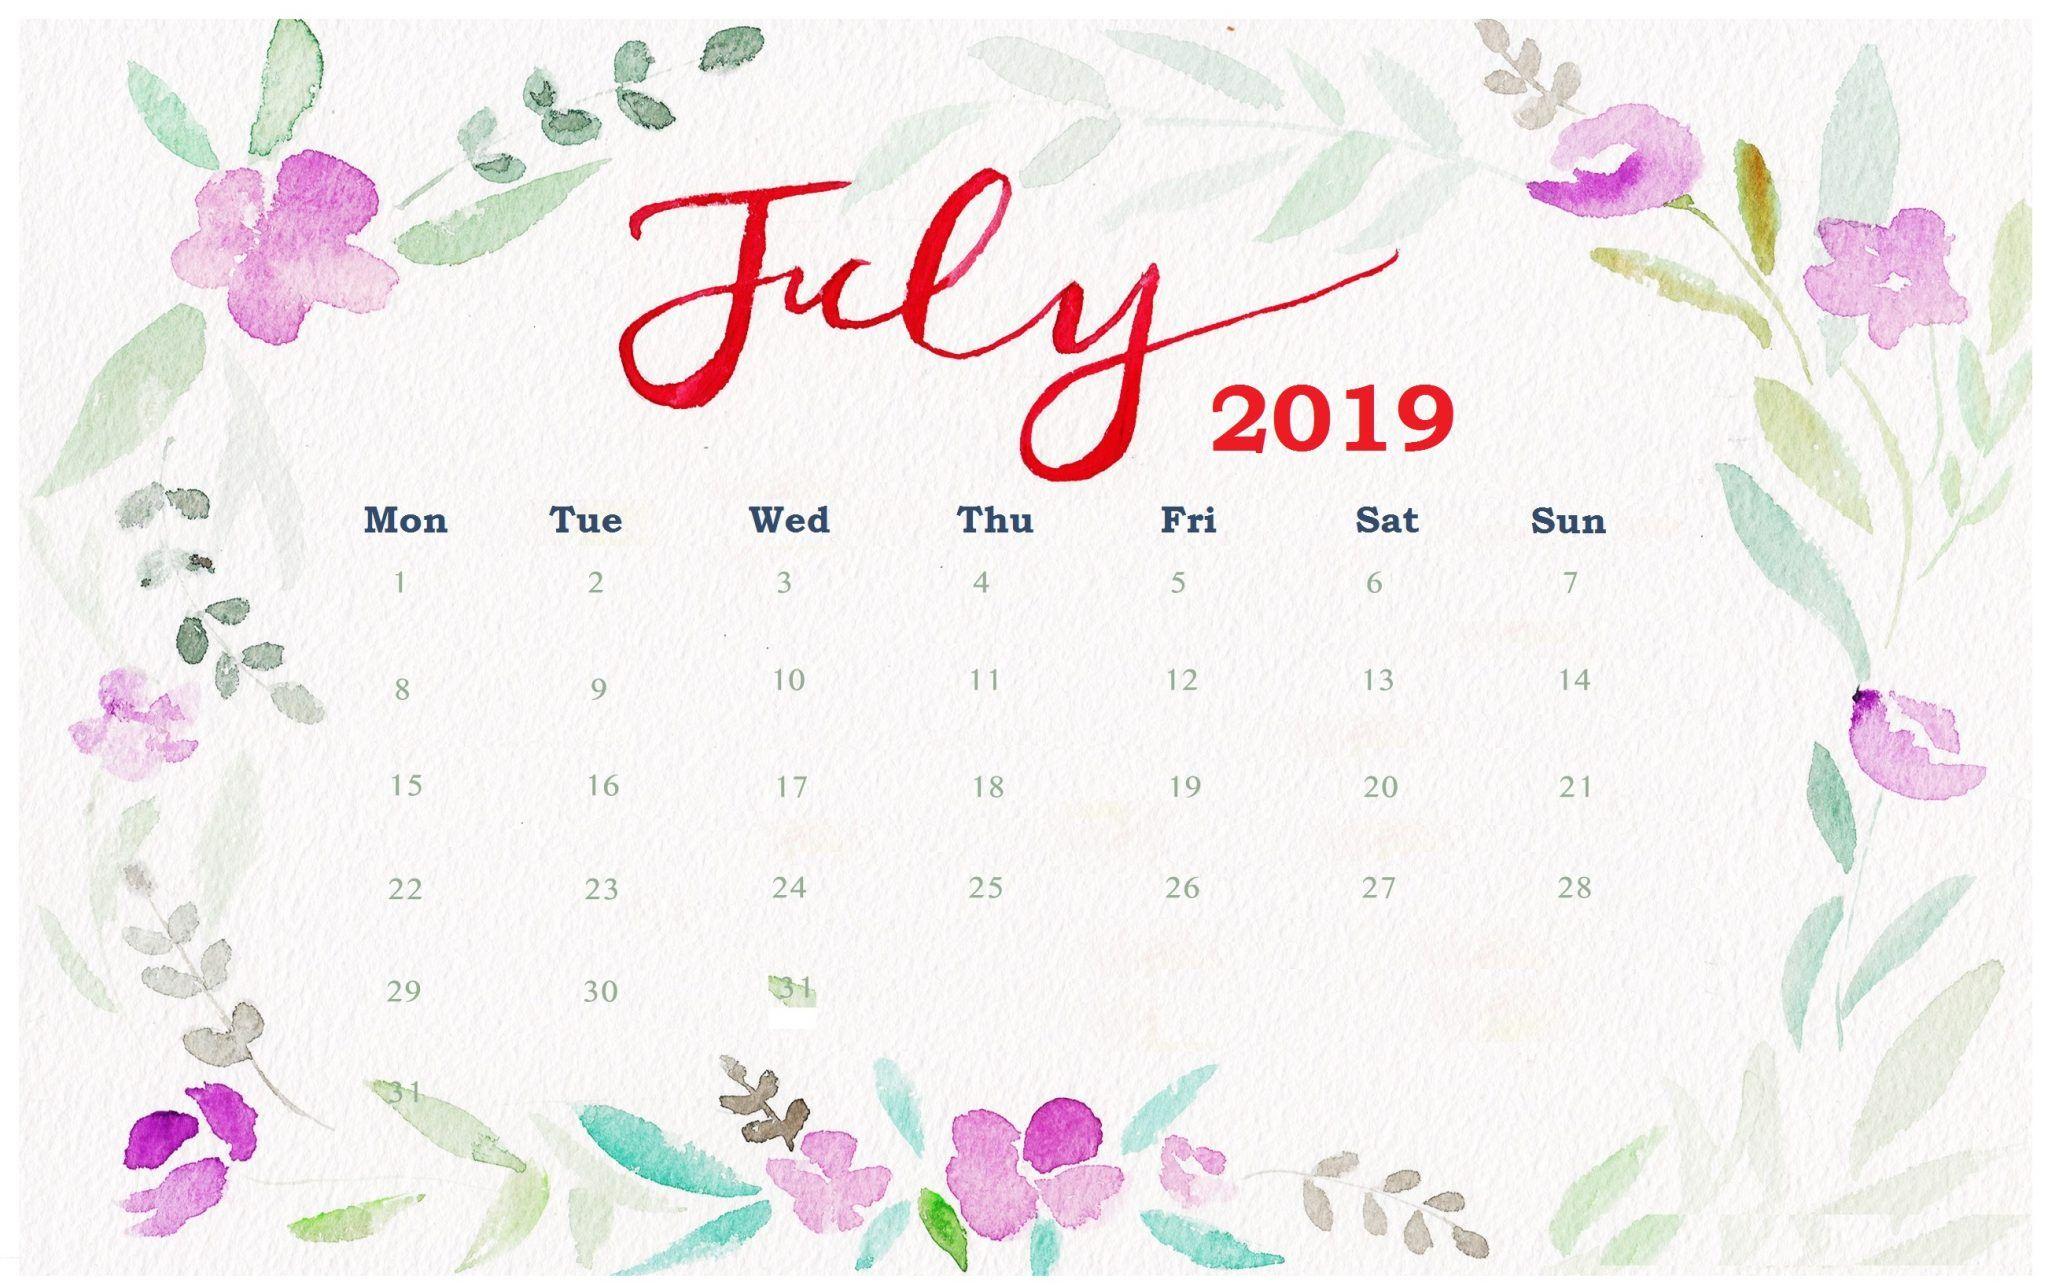 Watercolor July 2019 Desk Calendar Desktop Wallpaper Calendar Calendar Wallpaper Desktop Calendar